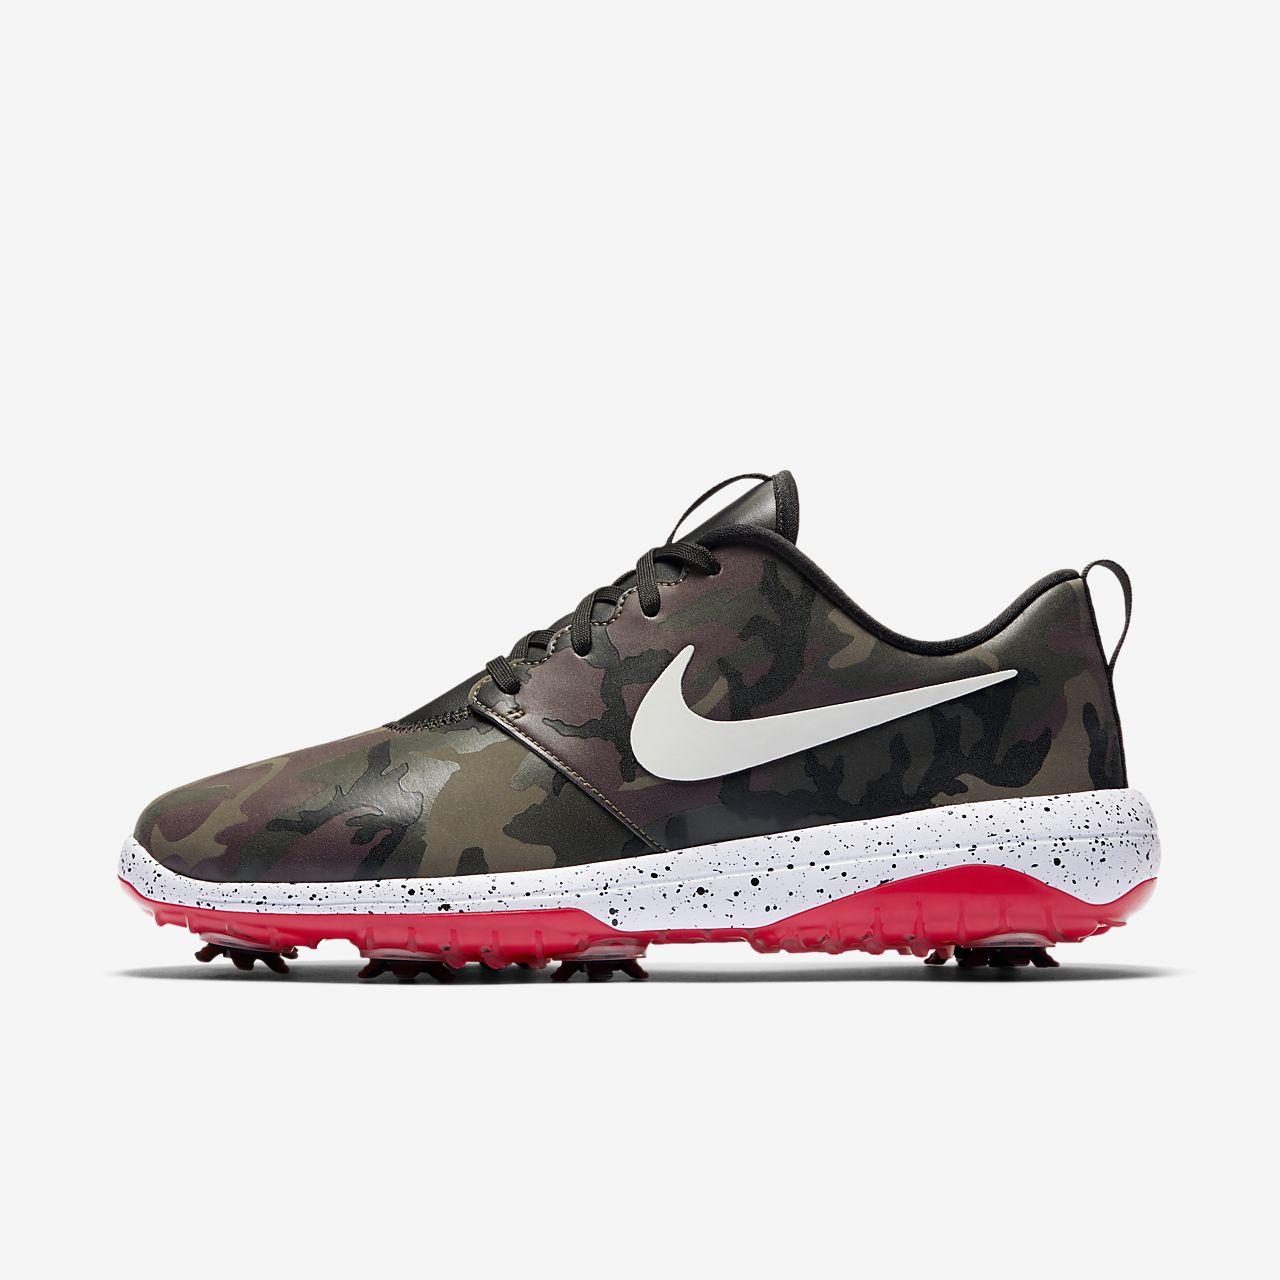 quality design 8397a a83f6 ... Męskie buty do golfa Nike Roshe G Tour NRG